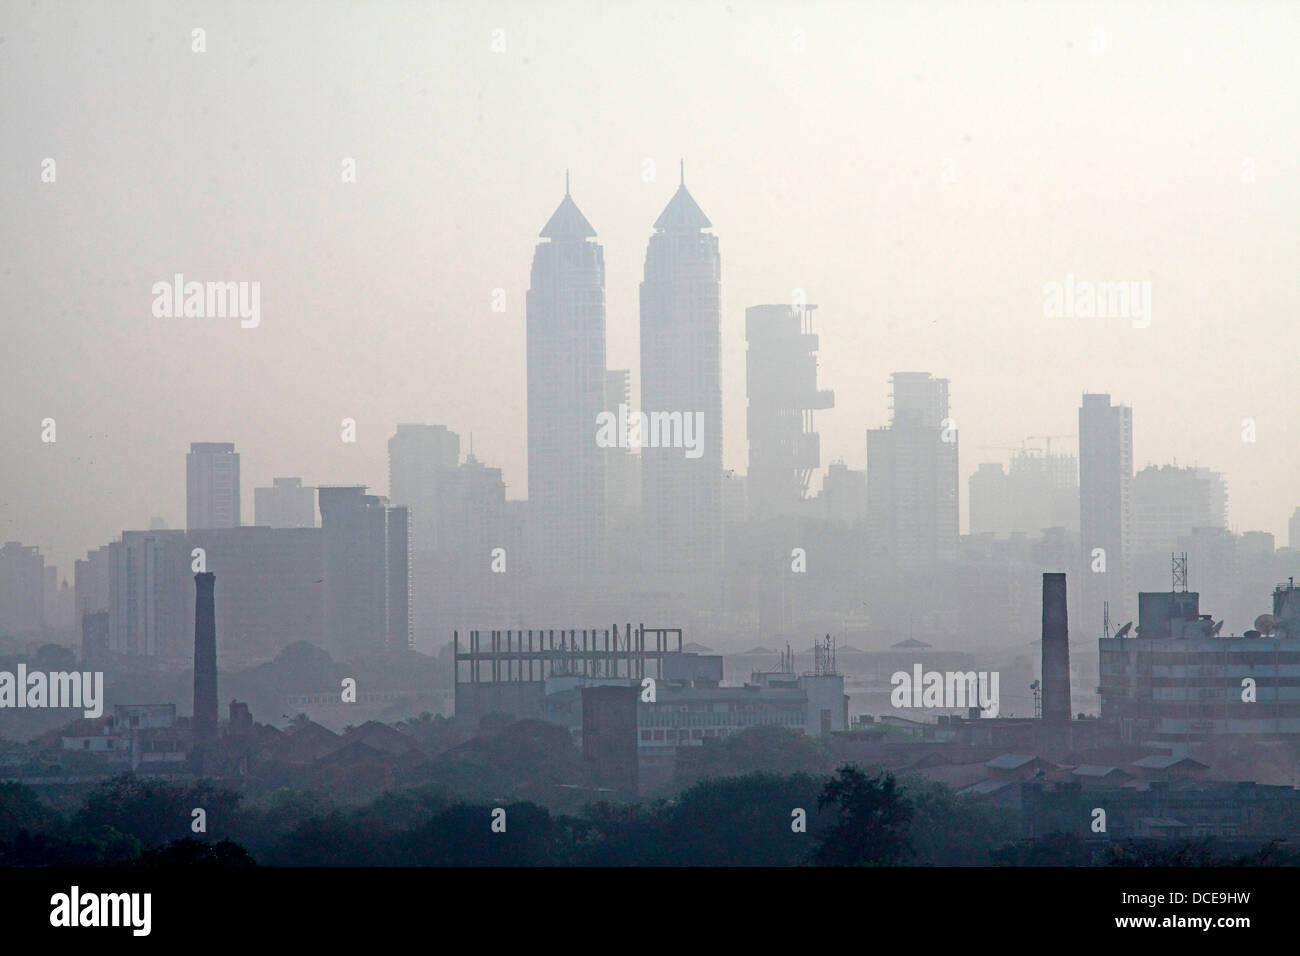 November 7, 2011 - Mumbai, Maharashtra, India - Ariel view of the Skyline of  Mumbai shows newly constrcuted luxury - Stock Image